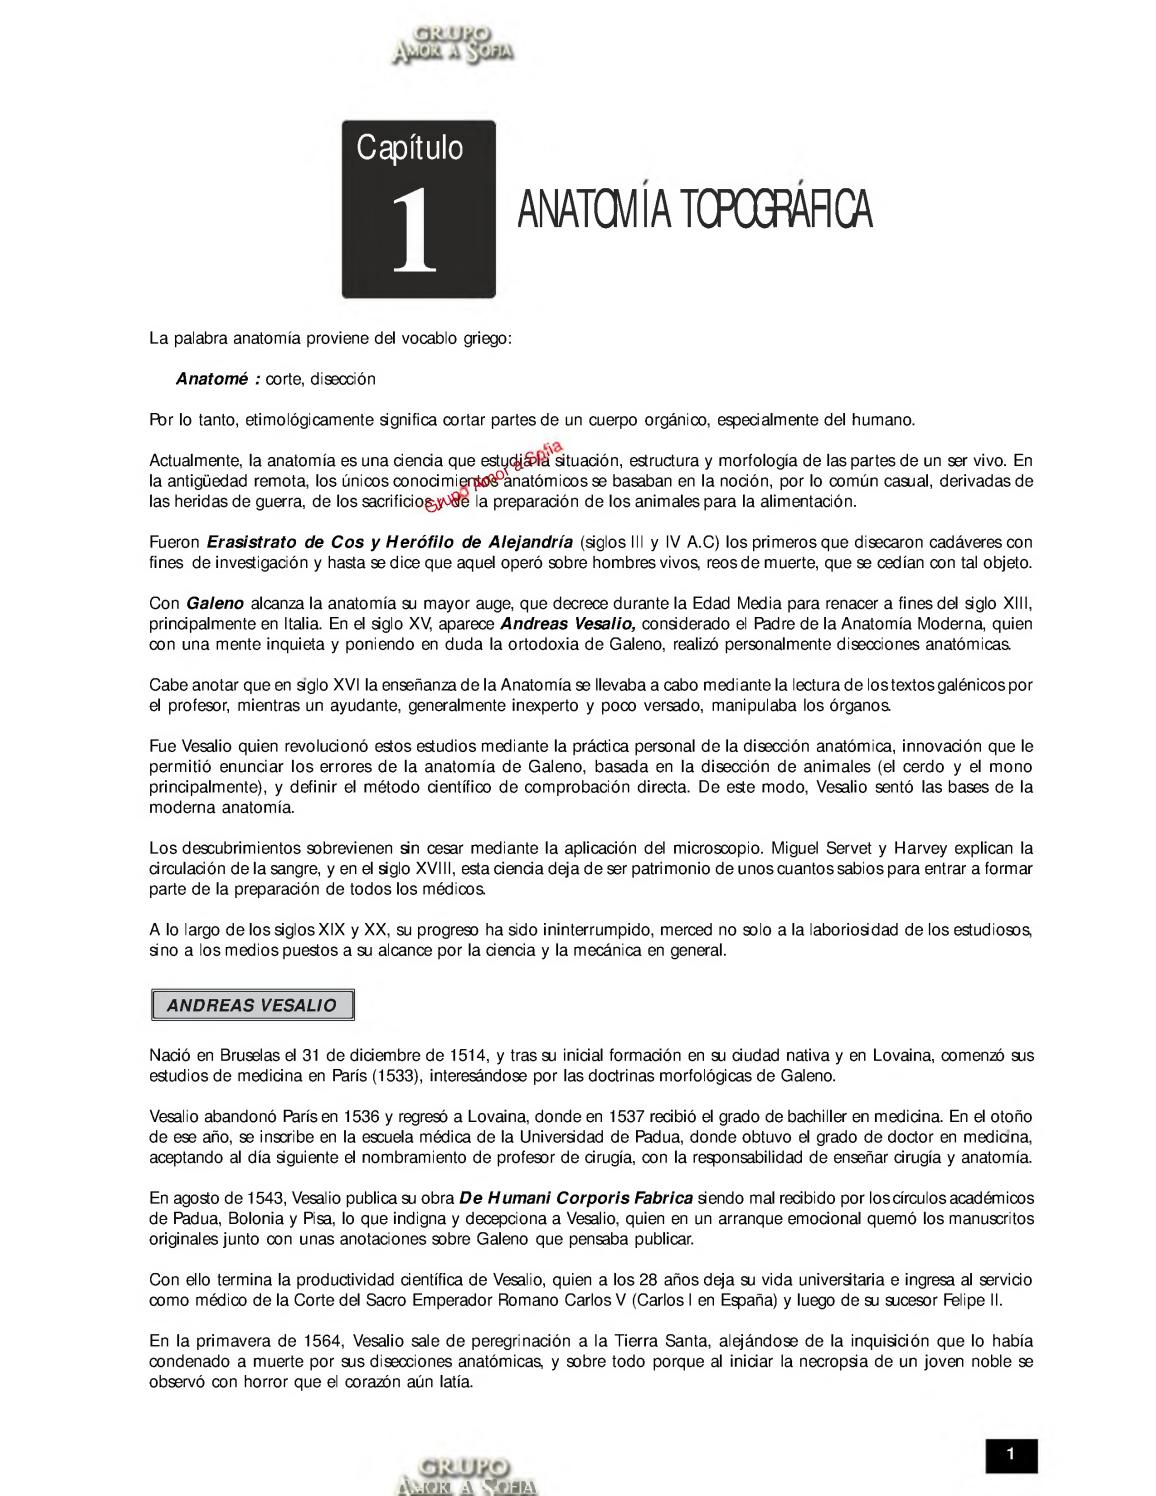 Anatomíatrilce by Hector OSCANOA SALAZAR - issuu